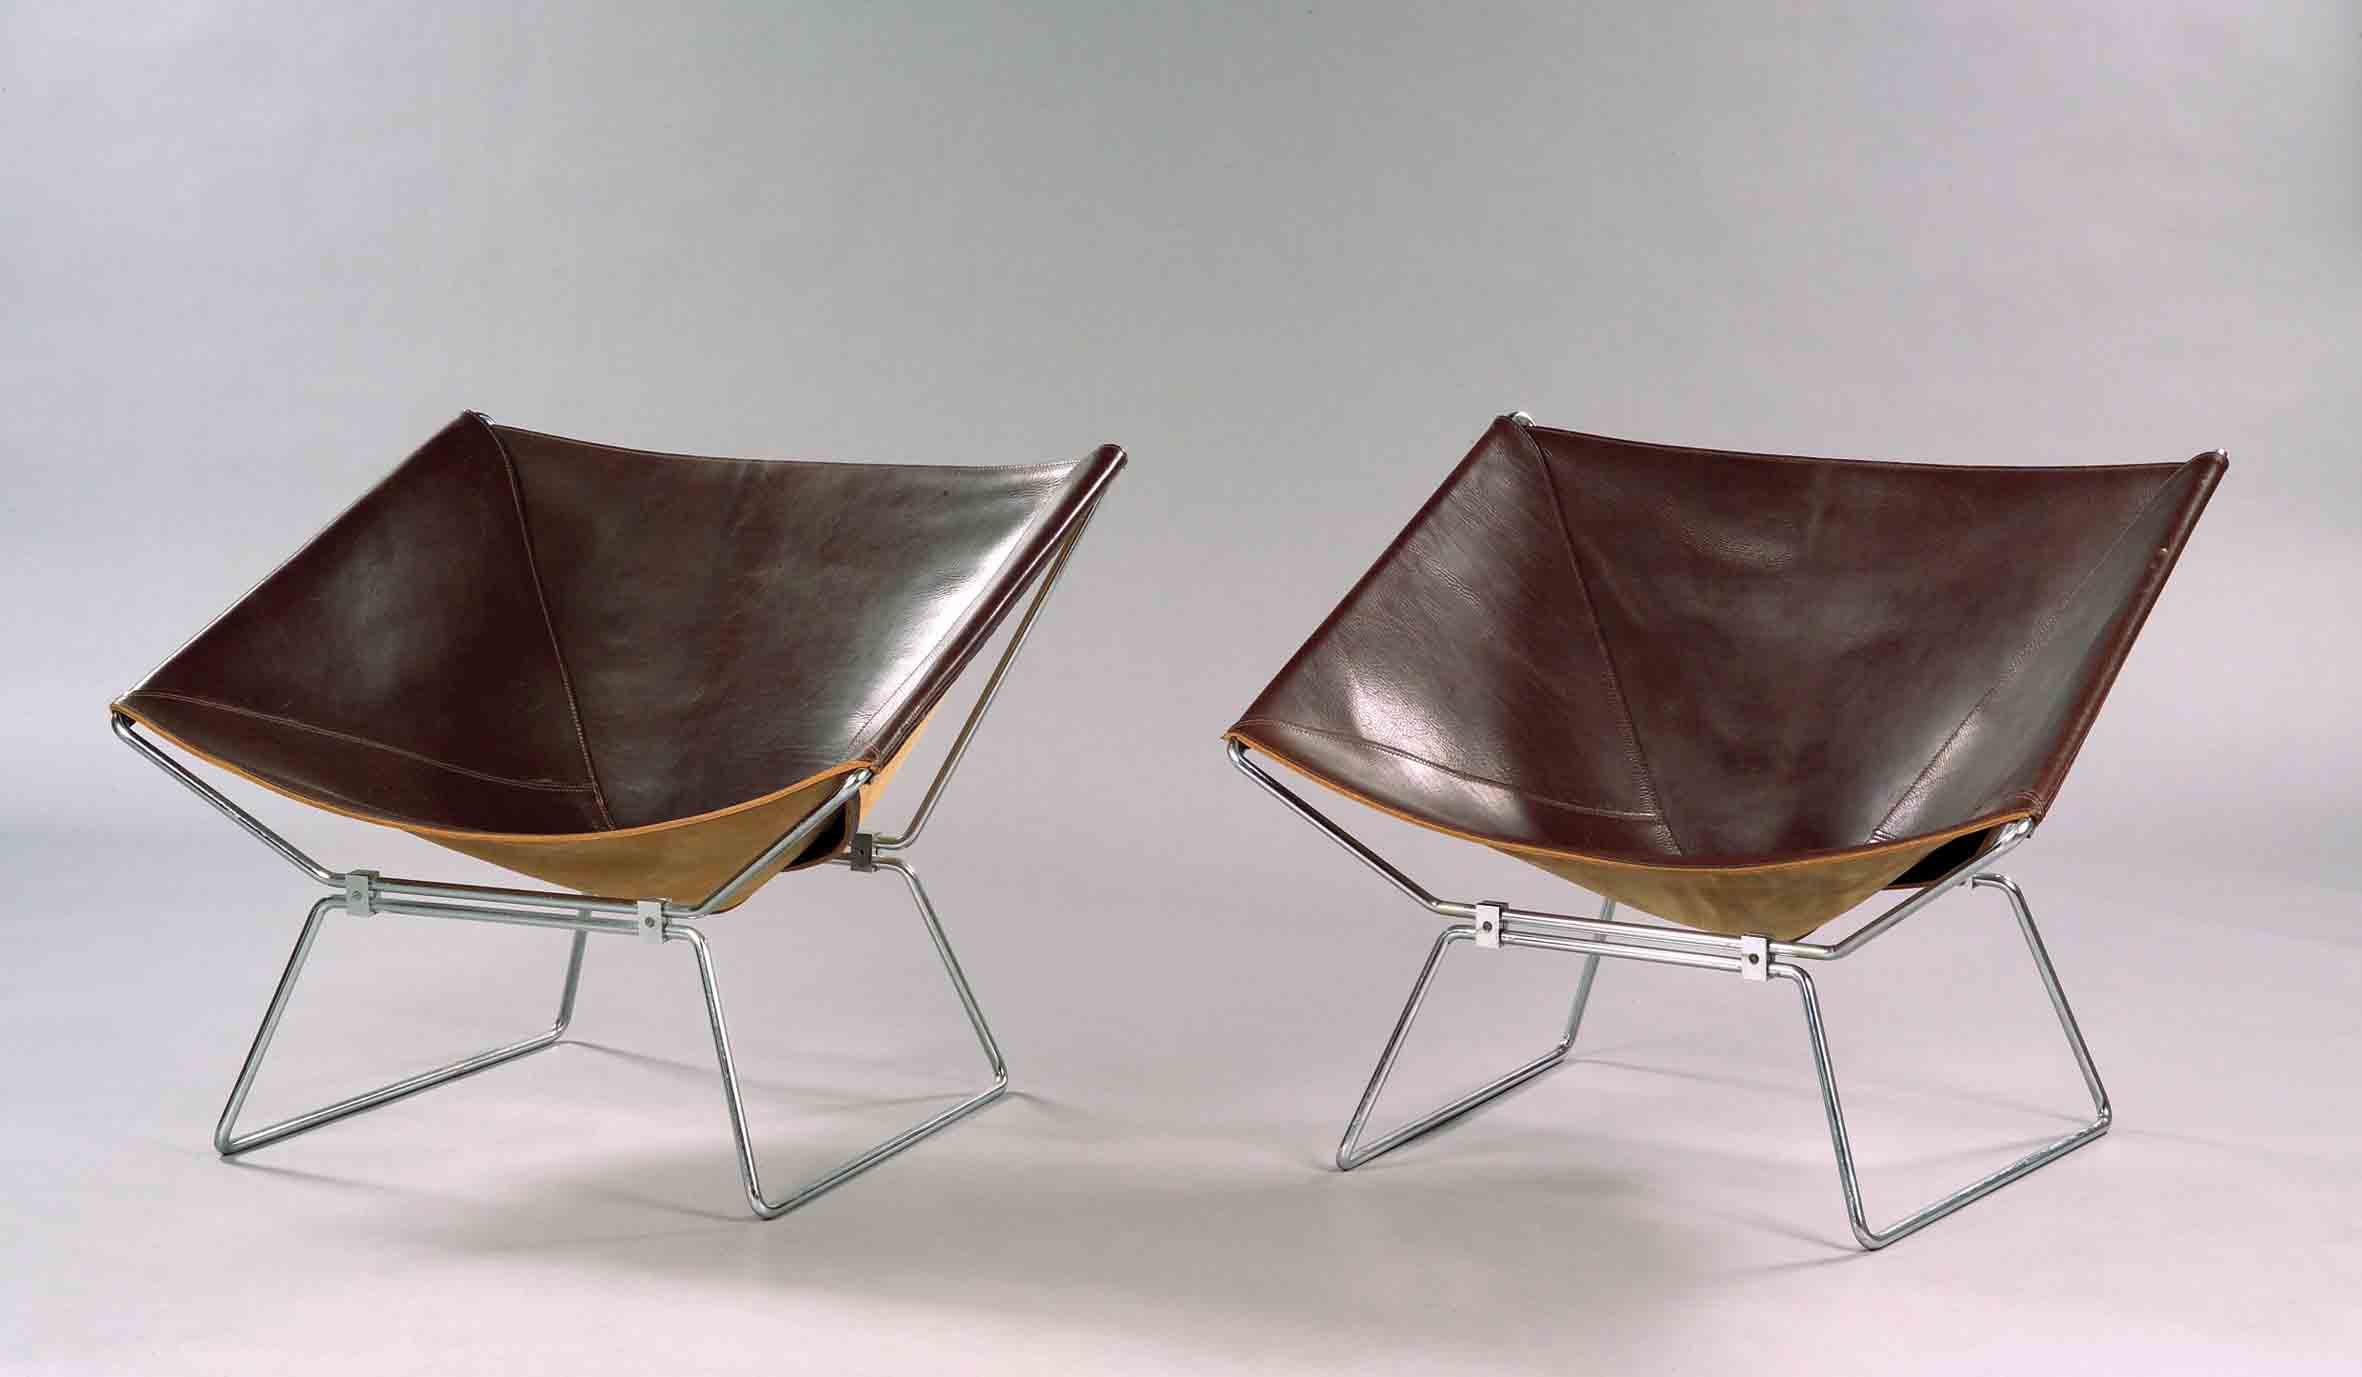 penccil pierre paulin convivality. Black Bedroom Furniture Sets. Home Design Ideas